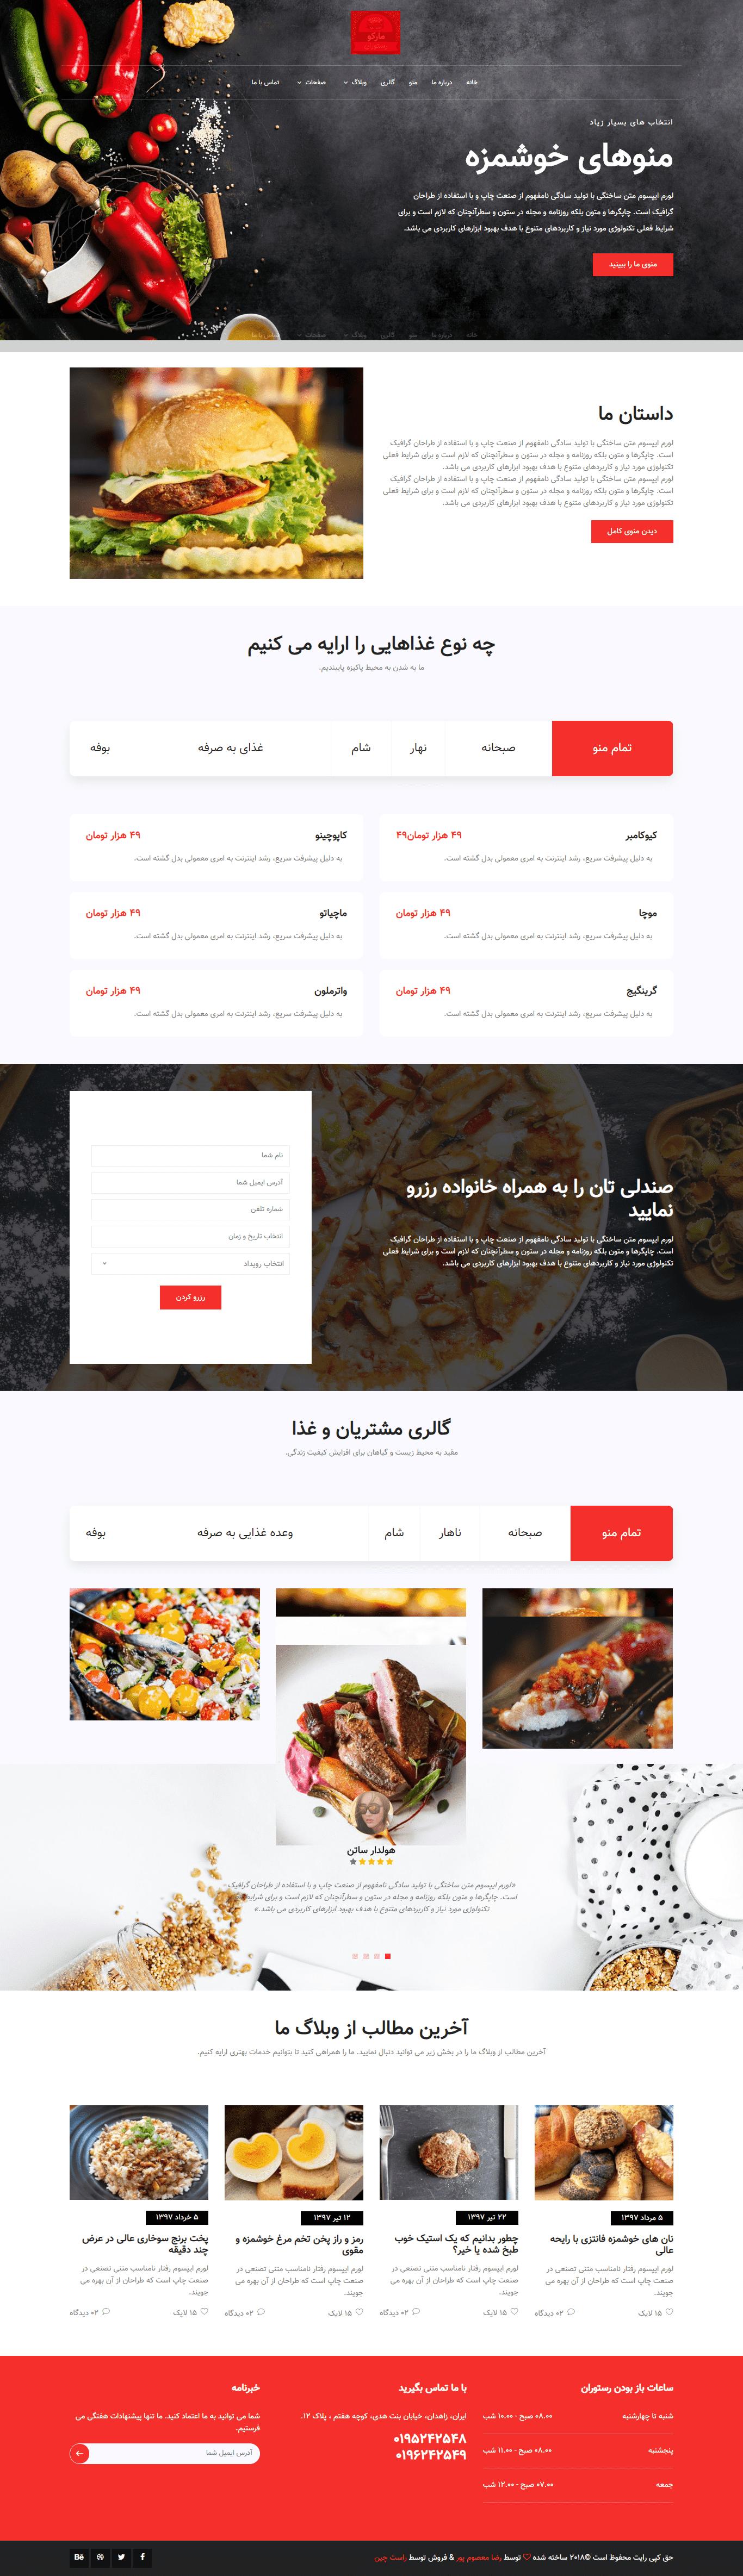 قالب رستوران Marco پوسته HTML حرفه ای آشپزی | خرید قالب html مارکو فول ریسپانسیو